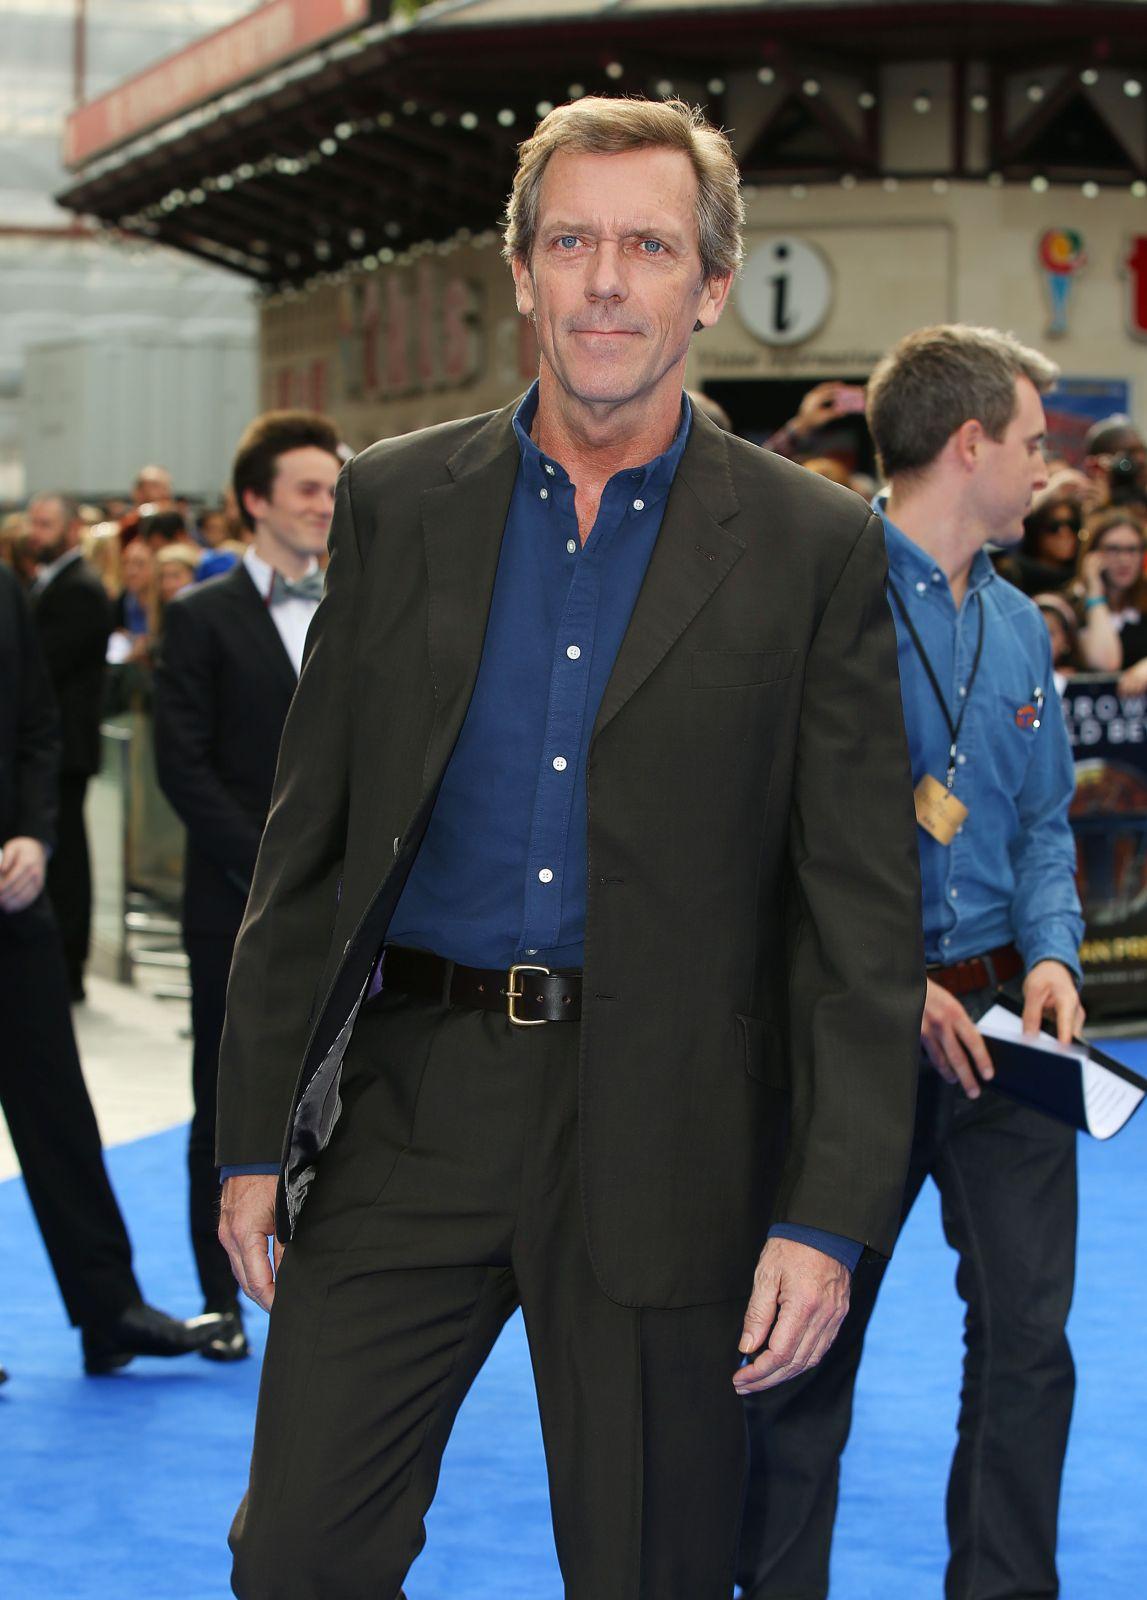 Hugh Laurie80 - Tomorrowland Premiere London 2015.jpg